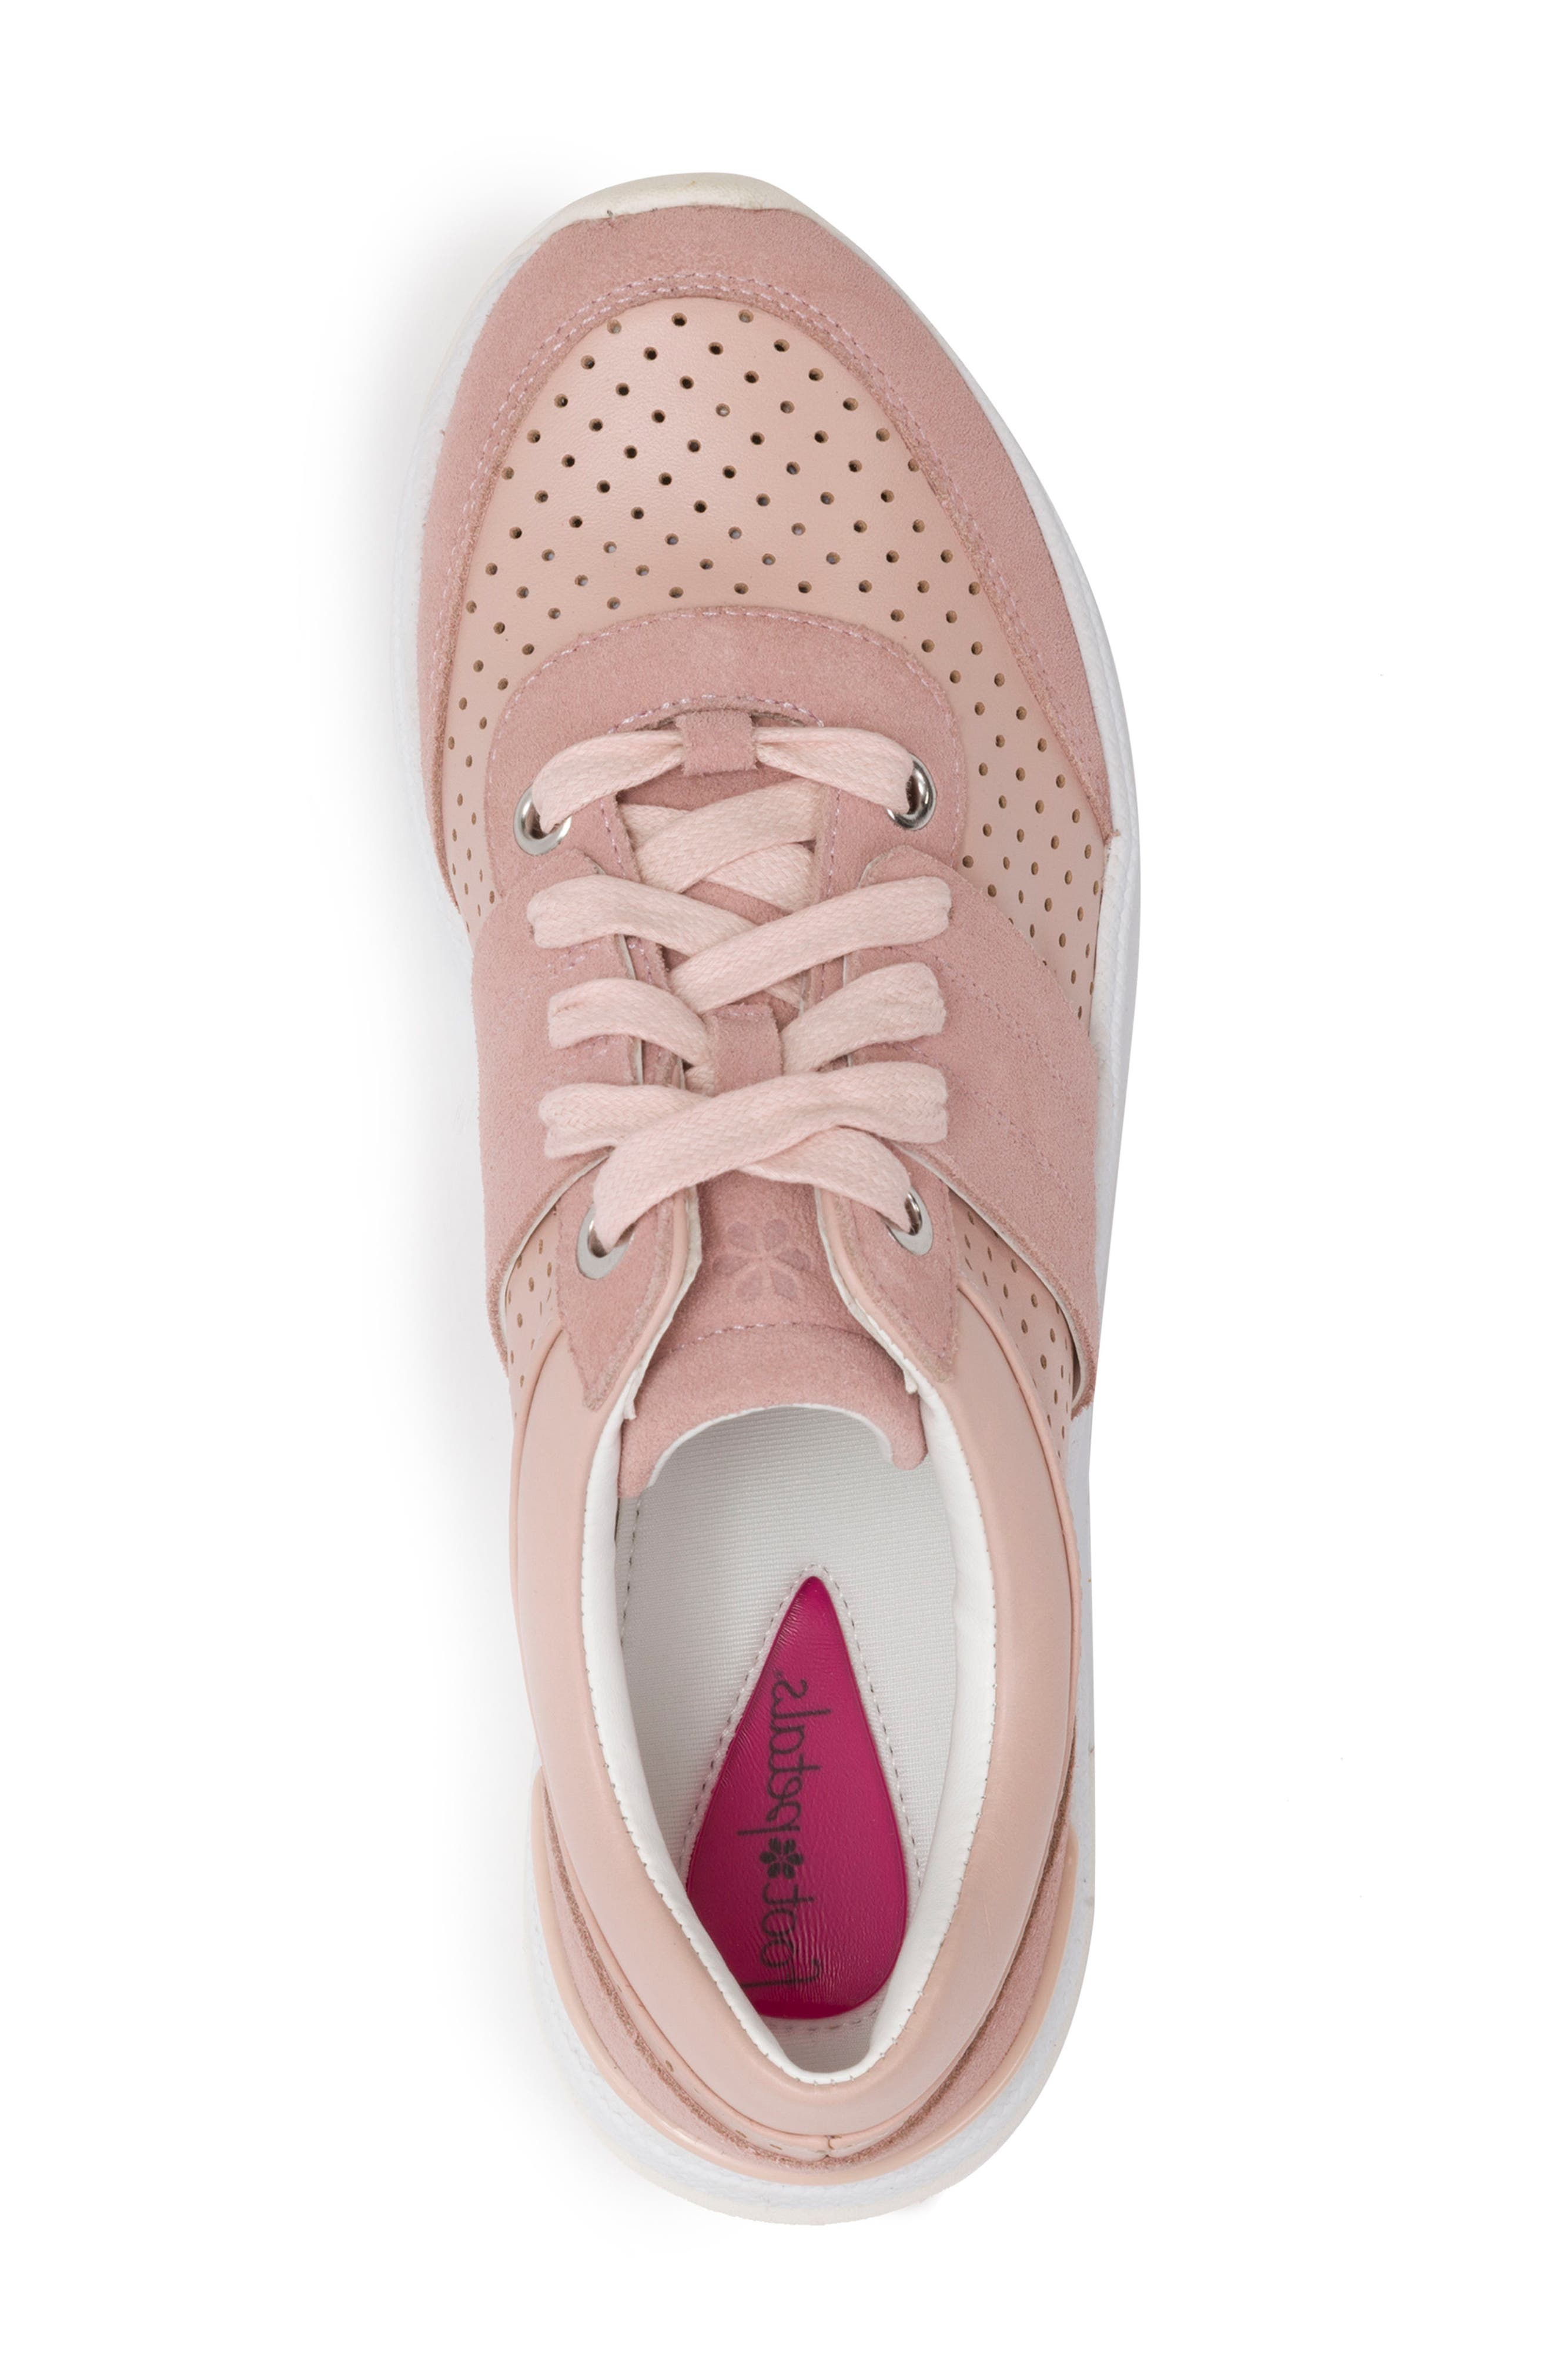 Bea Sneaker,                             Alternate thumbnail 5, color,                             Blush Leather